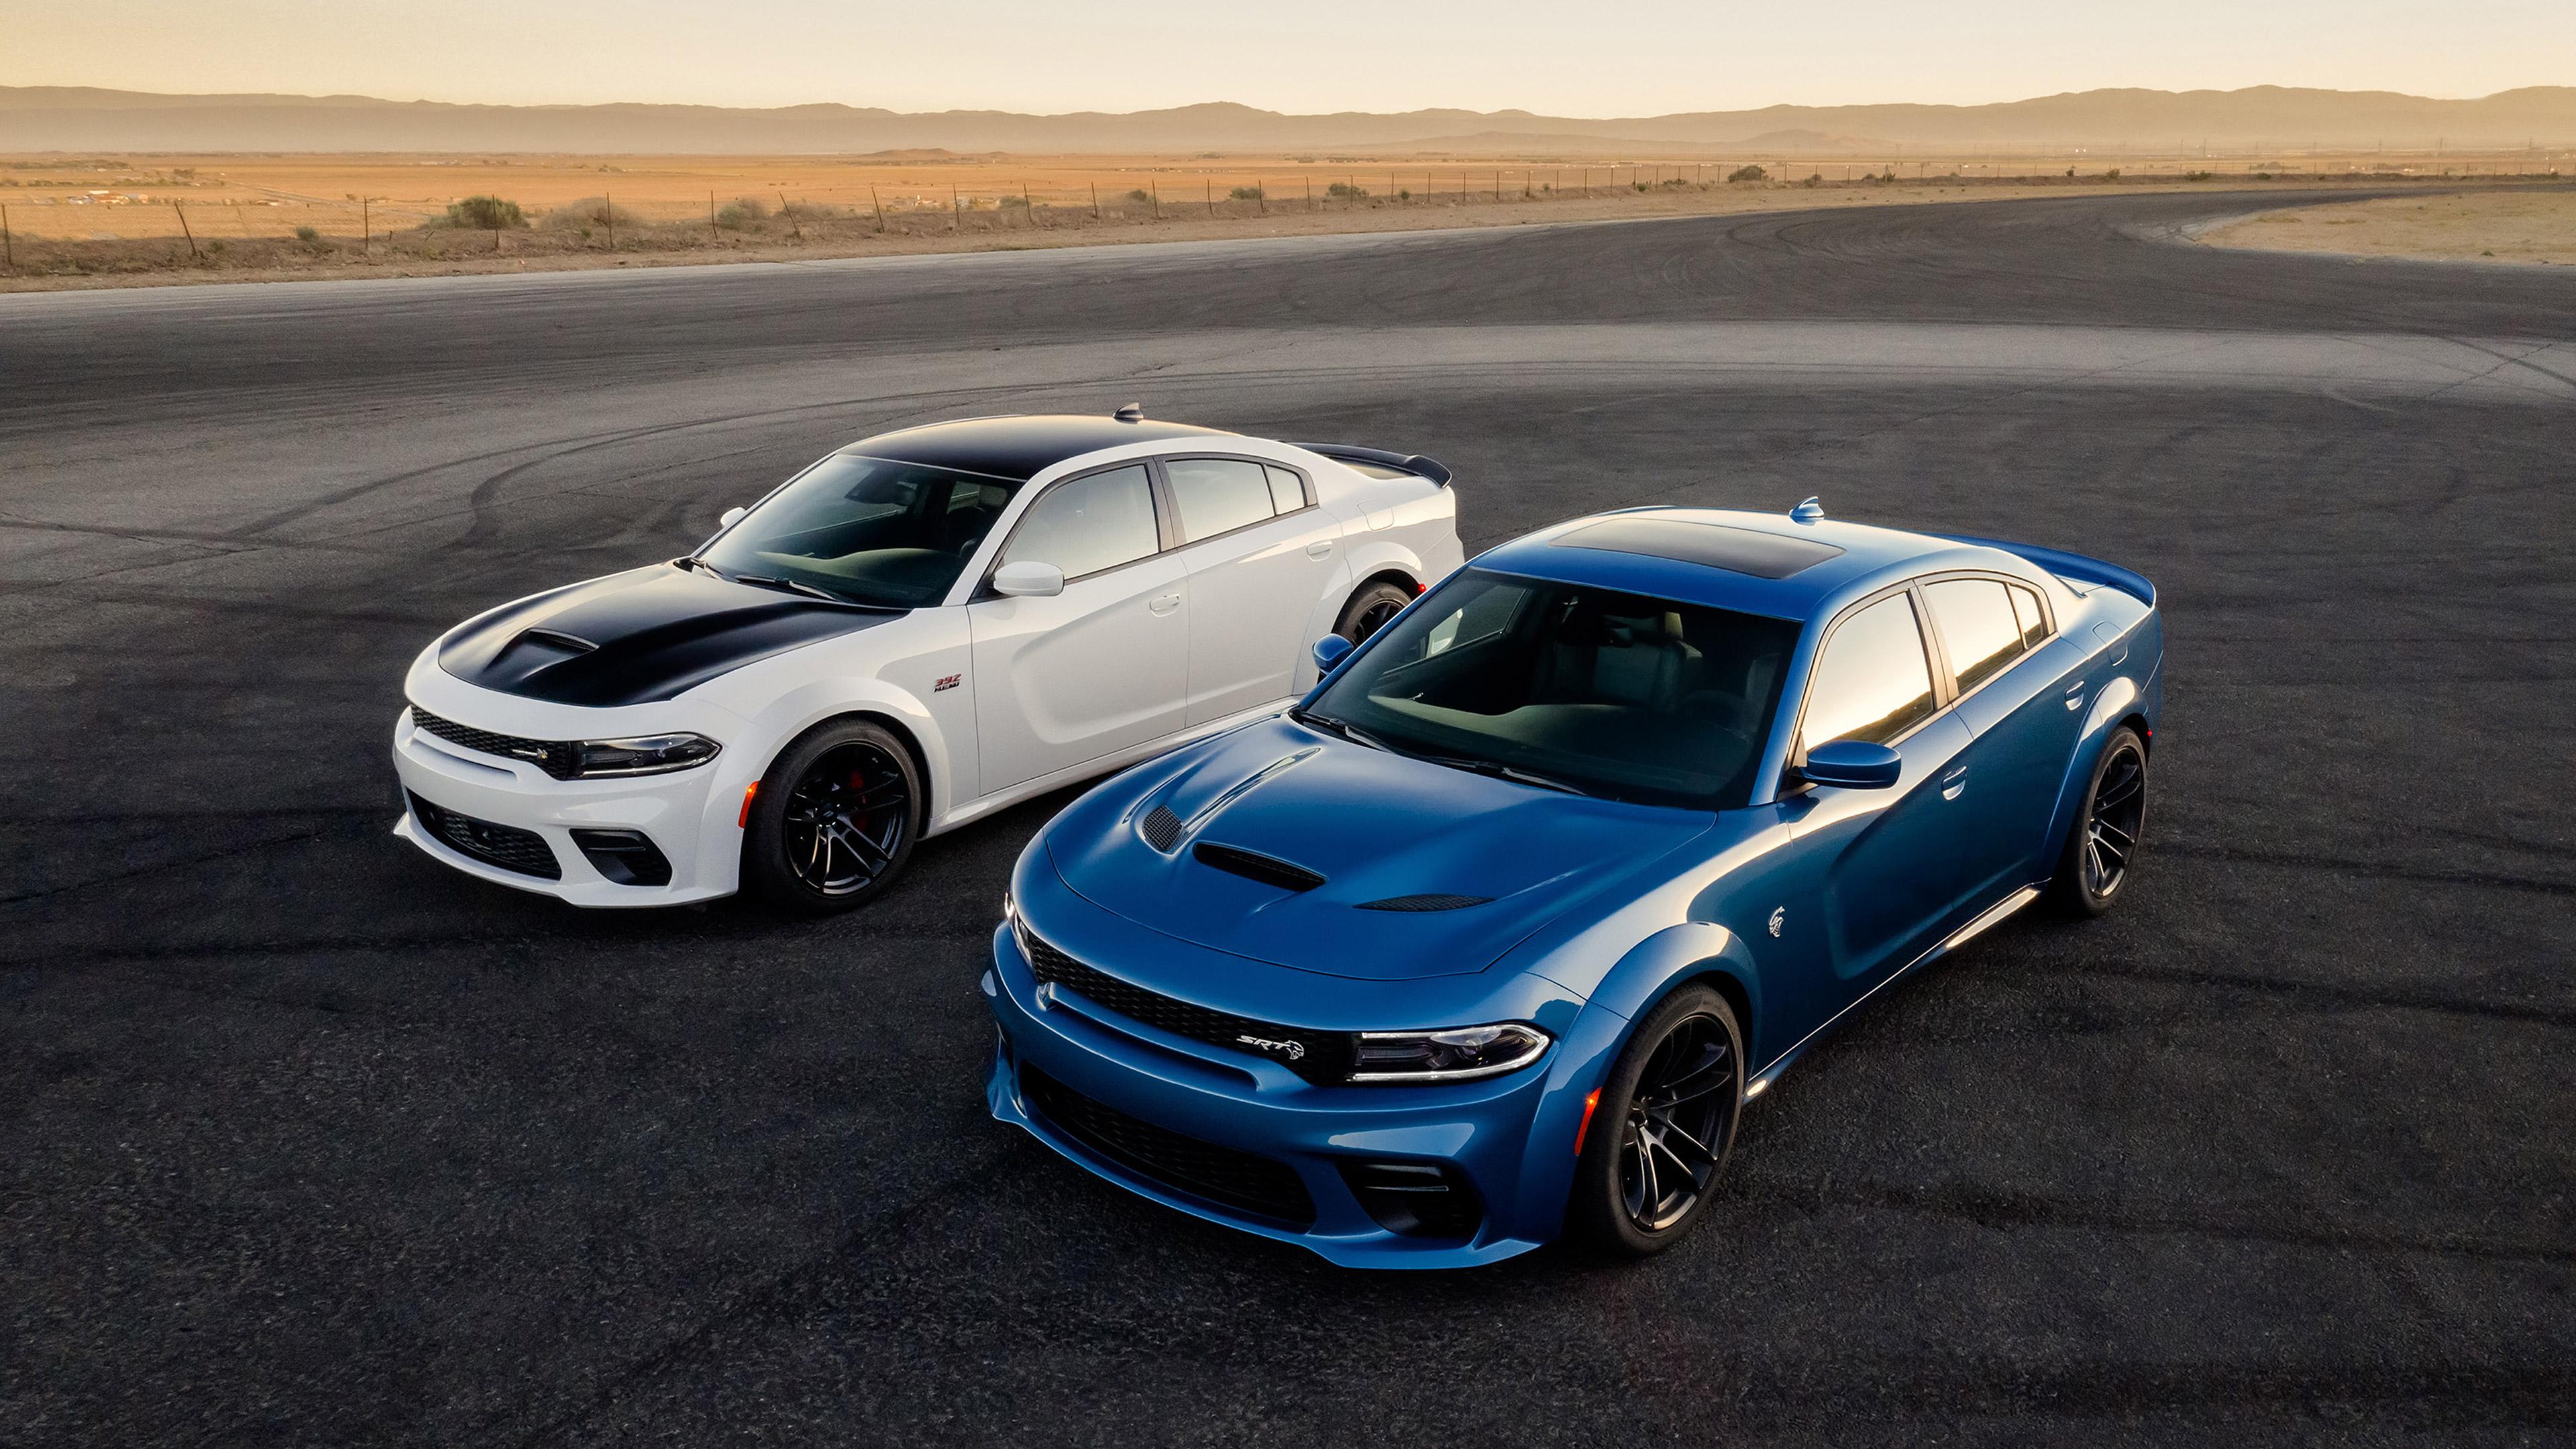 2020 Dodge Charger Srt Hellcat Widebody 4k Ultra Hd Wallpaper